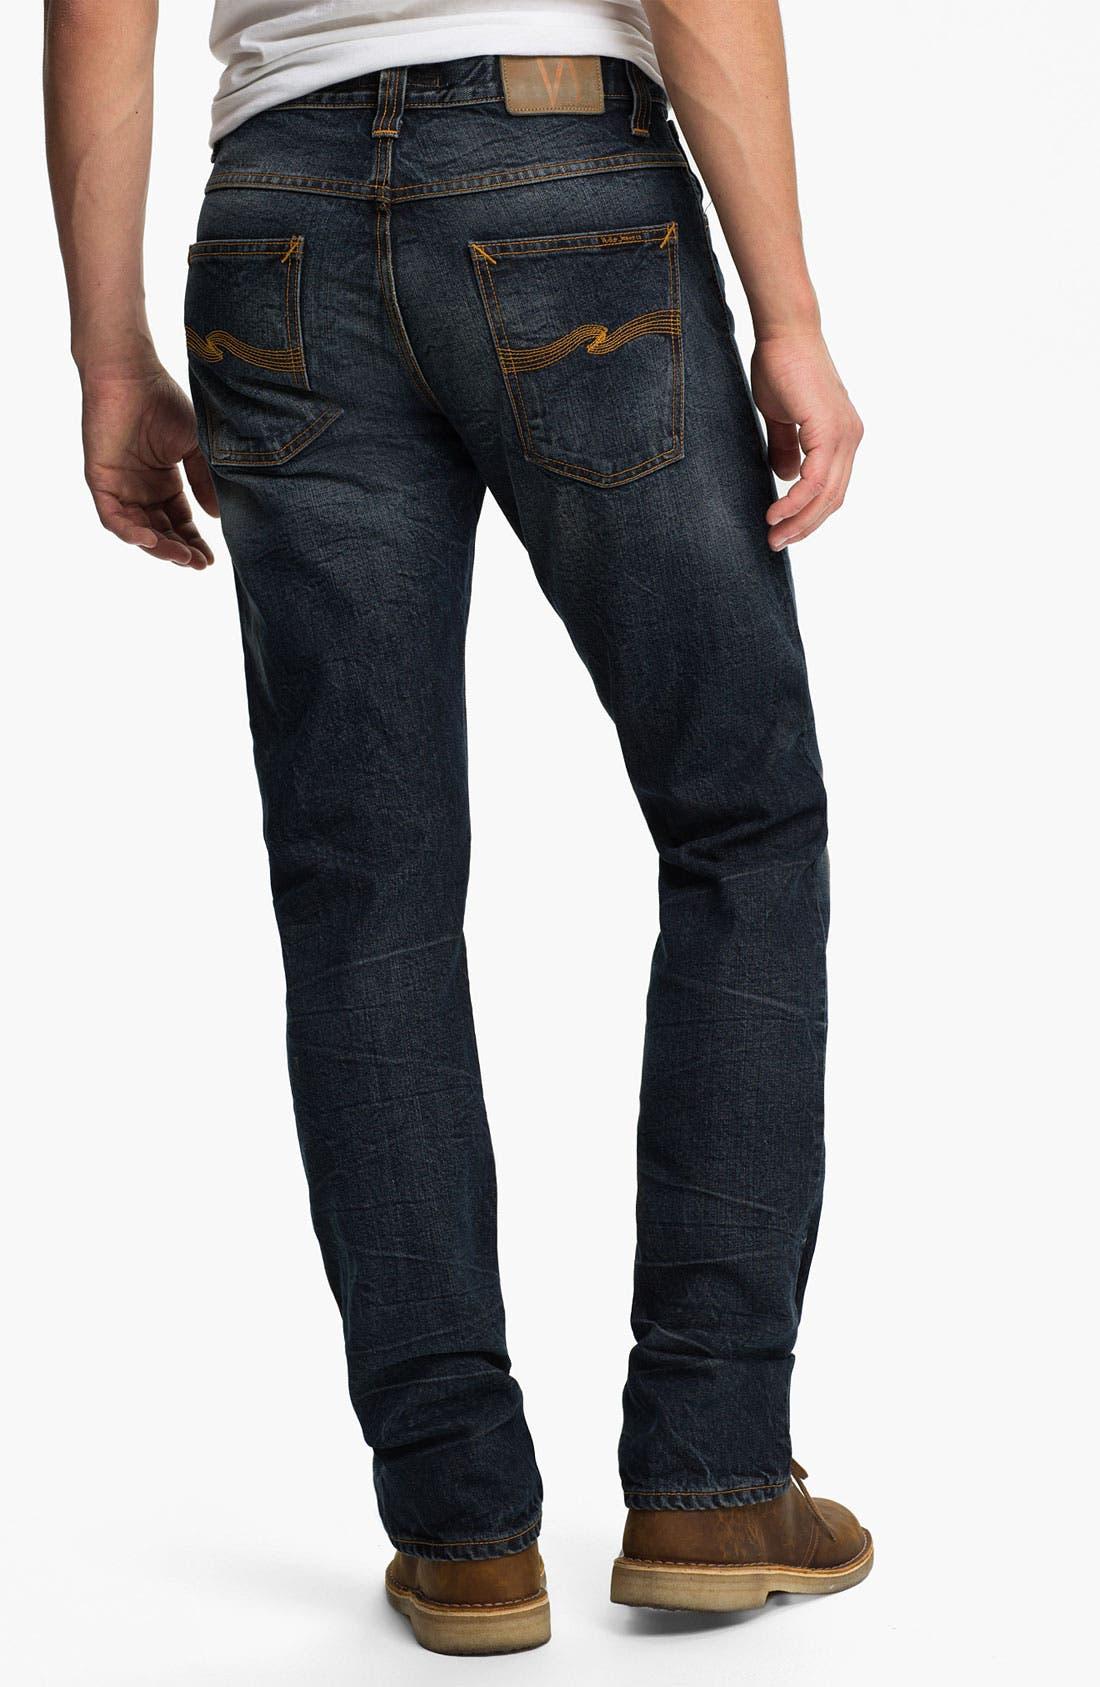 Alternate Image 1 Selected - Nudie 'Average Joe' Straight Leg Jeans (Organic Thorough Indigo)